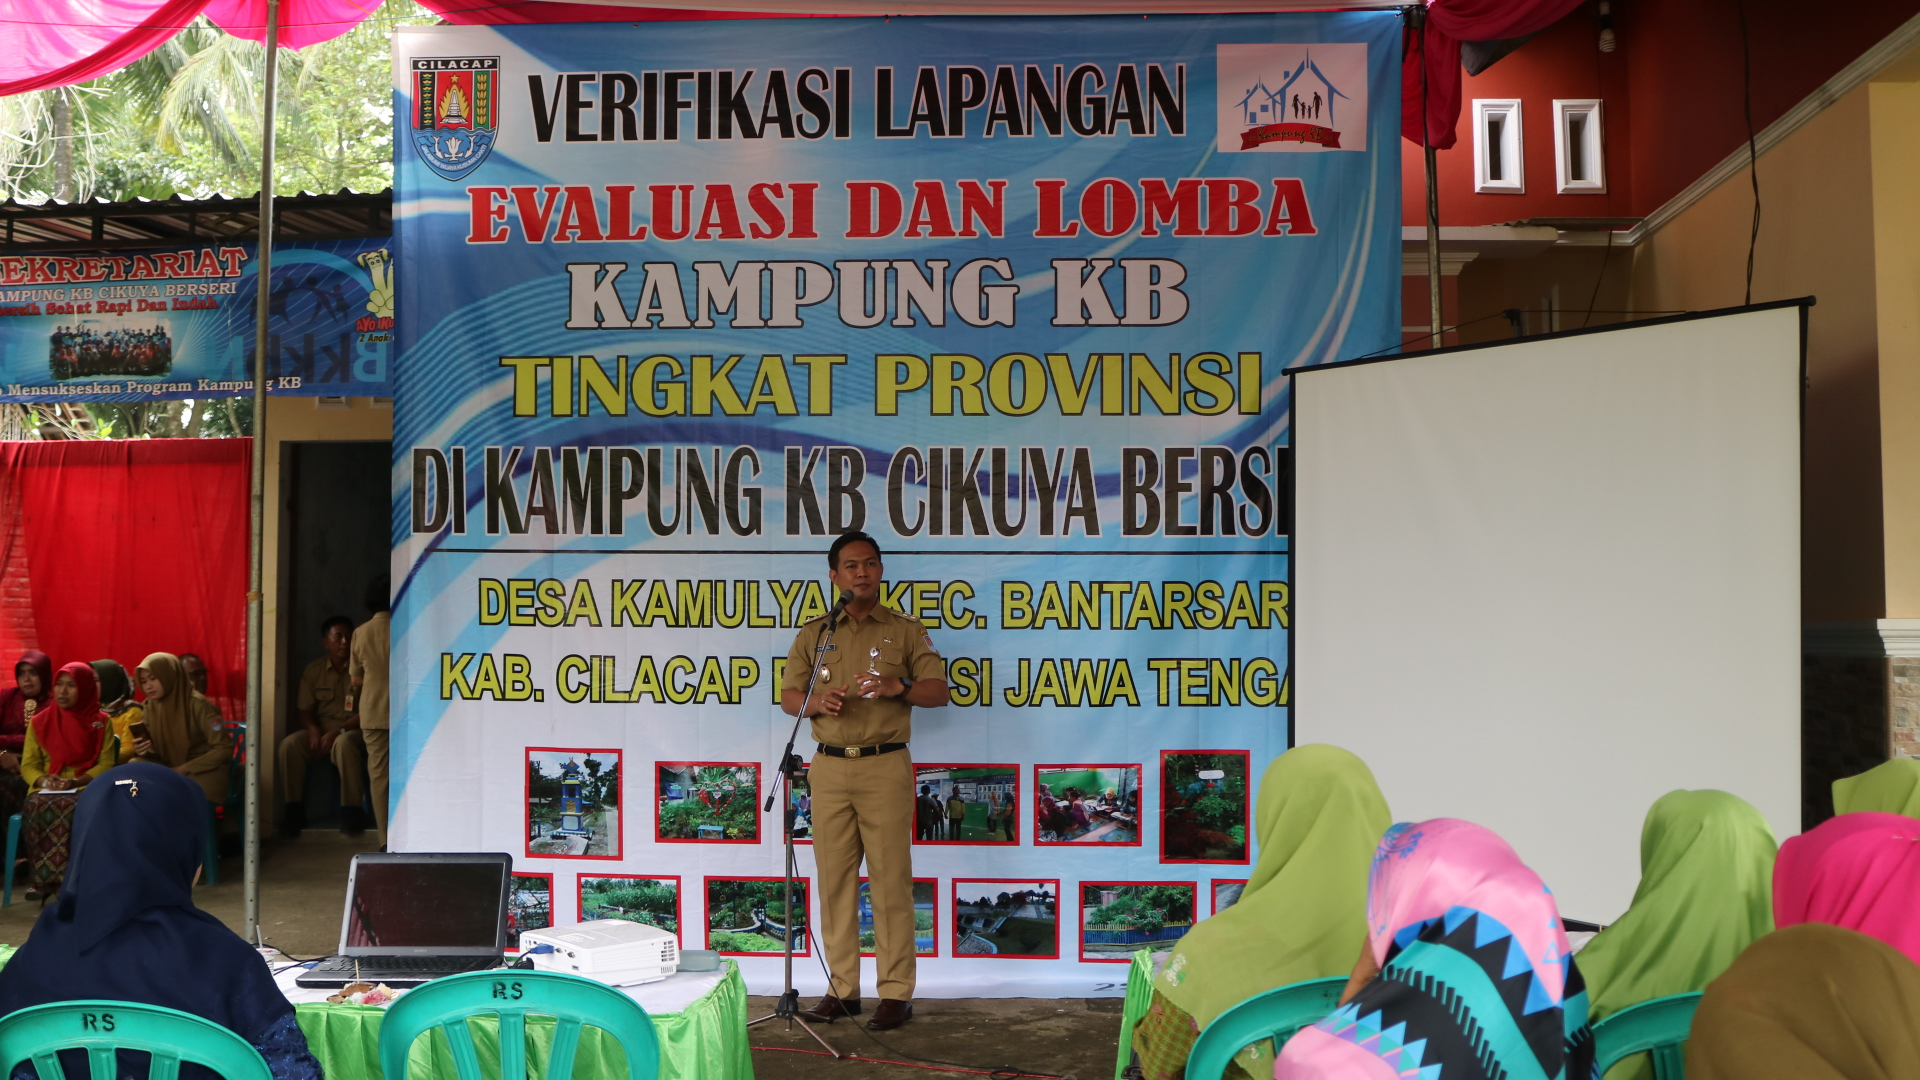 Verifikasi Lapangan Evaluasi dan Lomba Kampung KB Tingkat Provinsi Jawa Tengah